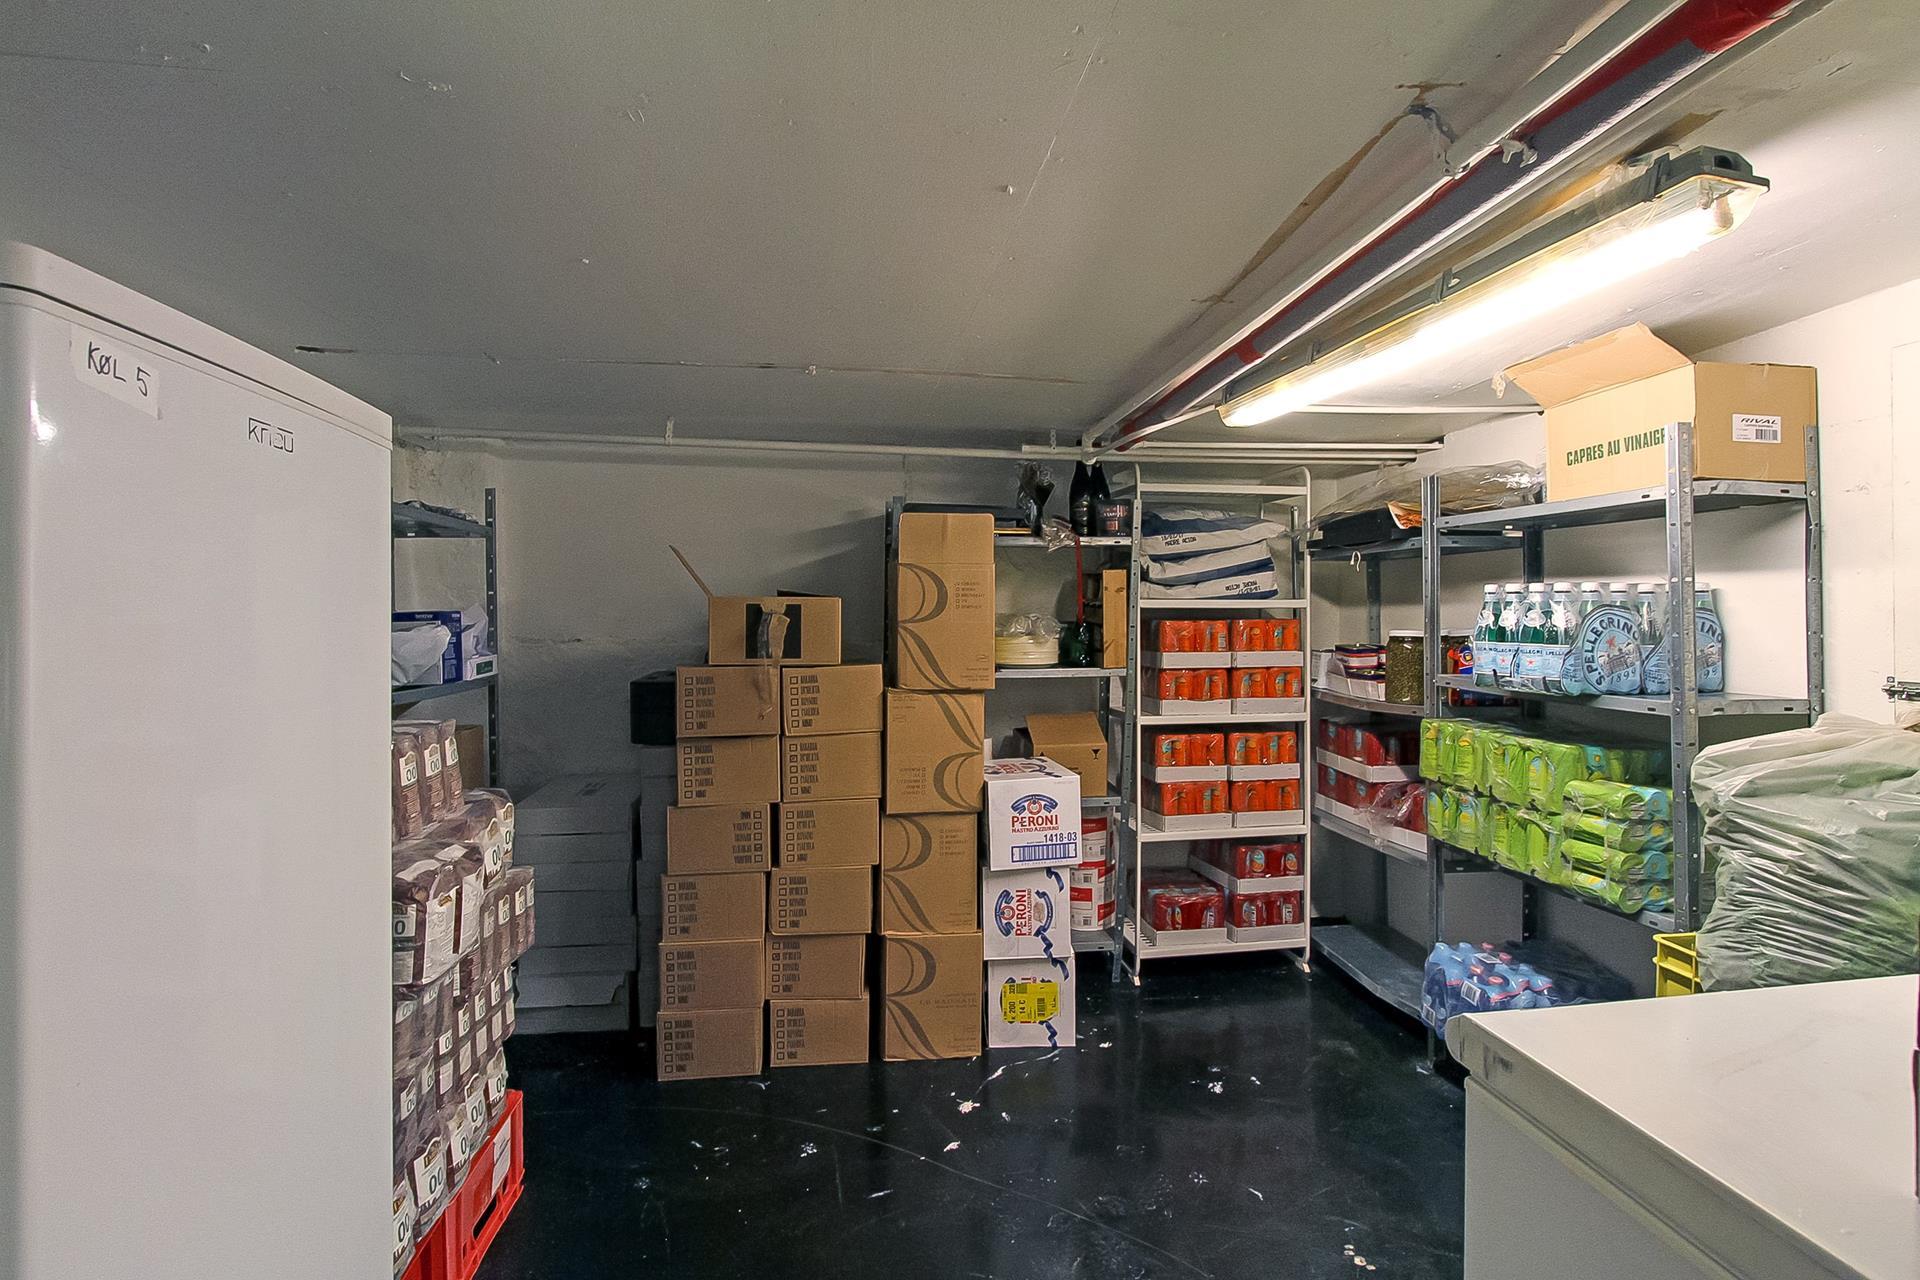 Bolig/erhverv på Jægergårdsgade i Aarhus C - Erhverv